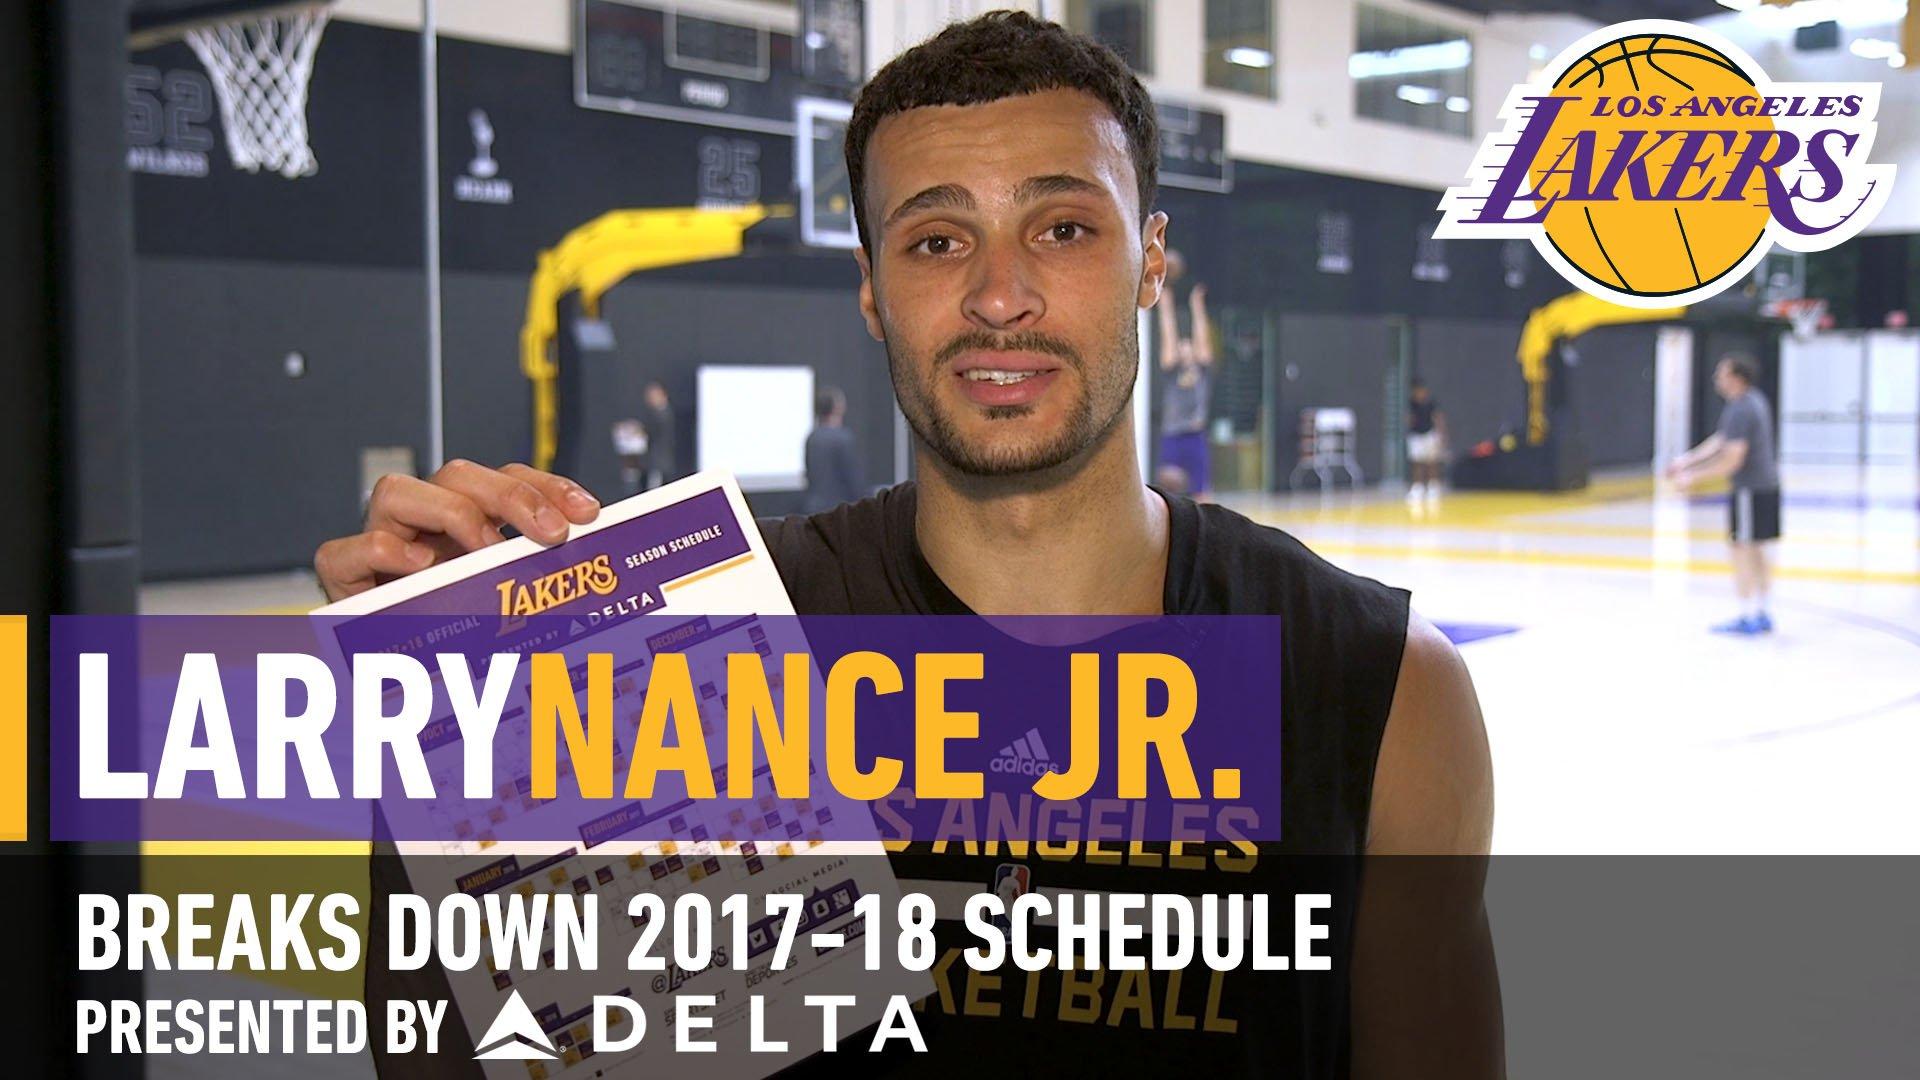 Larry Nance Jr. highlights some key dates in the 2017-18 season. https://t.co/RrEAJQZbrC